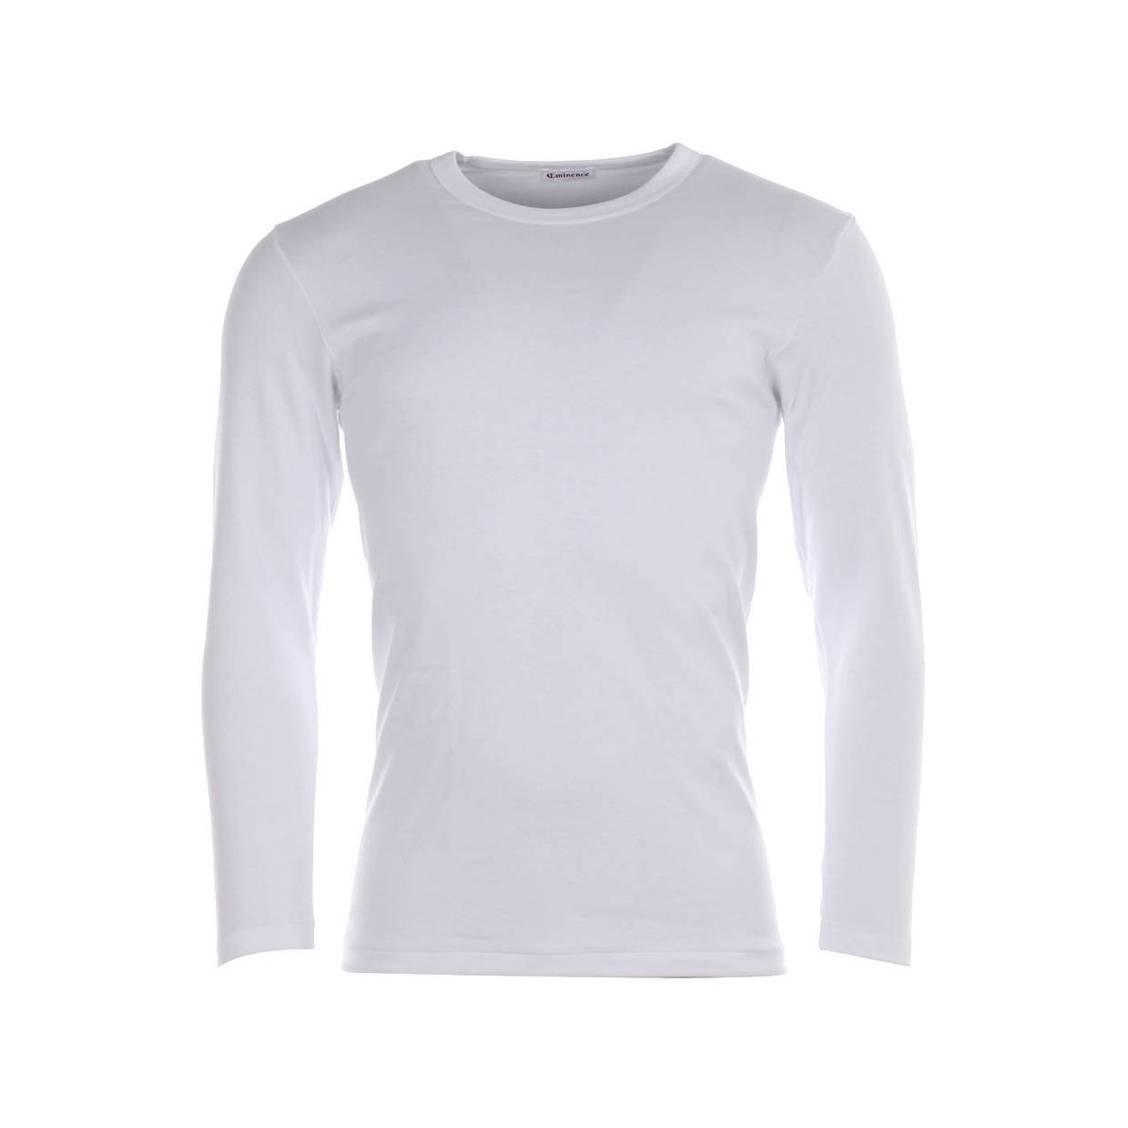 tee shirt manches longues chaleur naturelle douce eminence. Black Bedroom Furniture Sets. Home Design Ideas